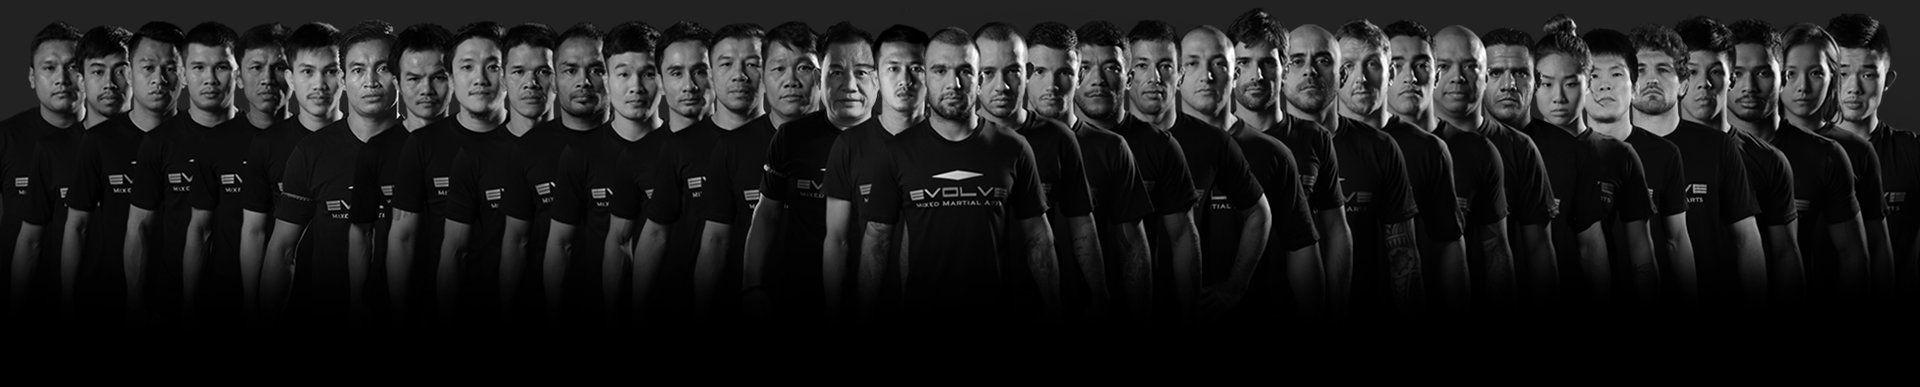 379bf28f3 Evolve MMA Singapore | Asia's #1 Mixed Martial Arts Gym